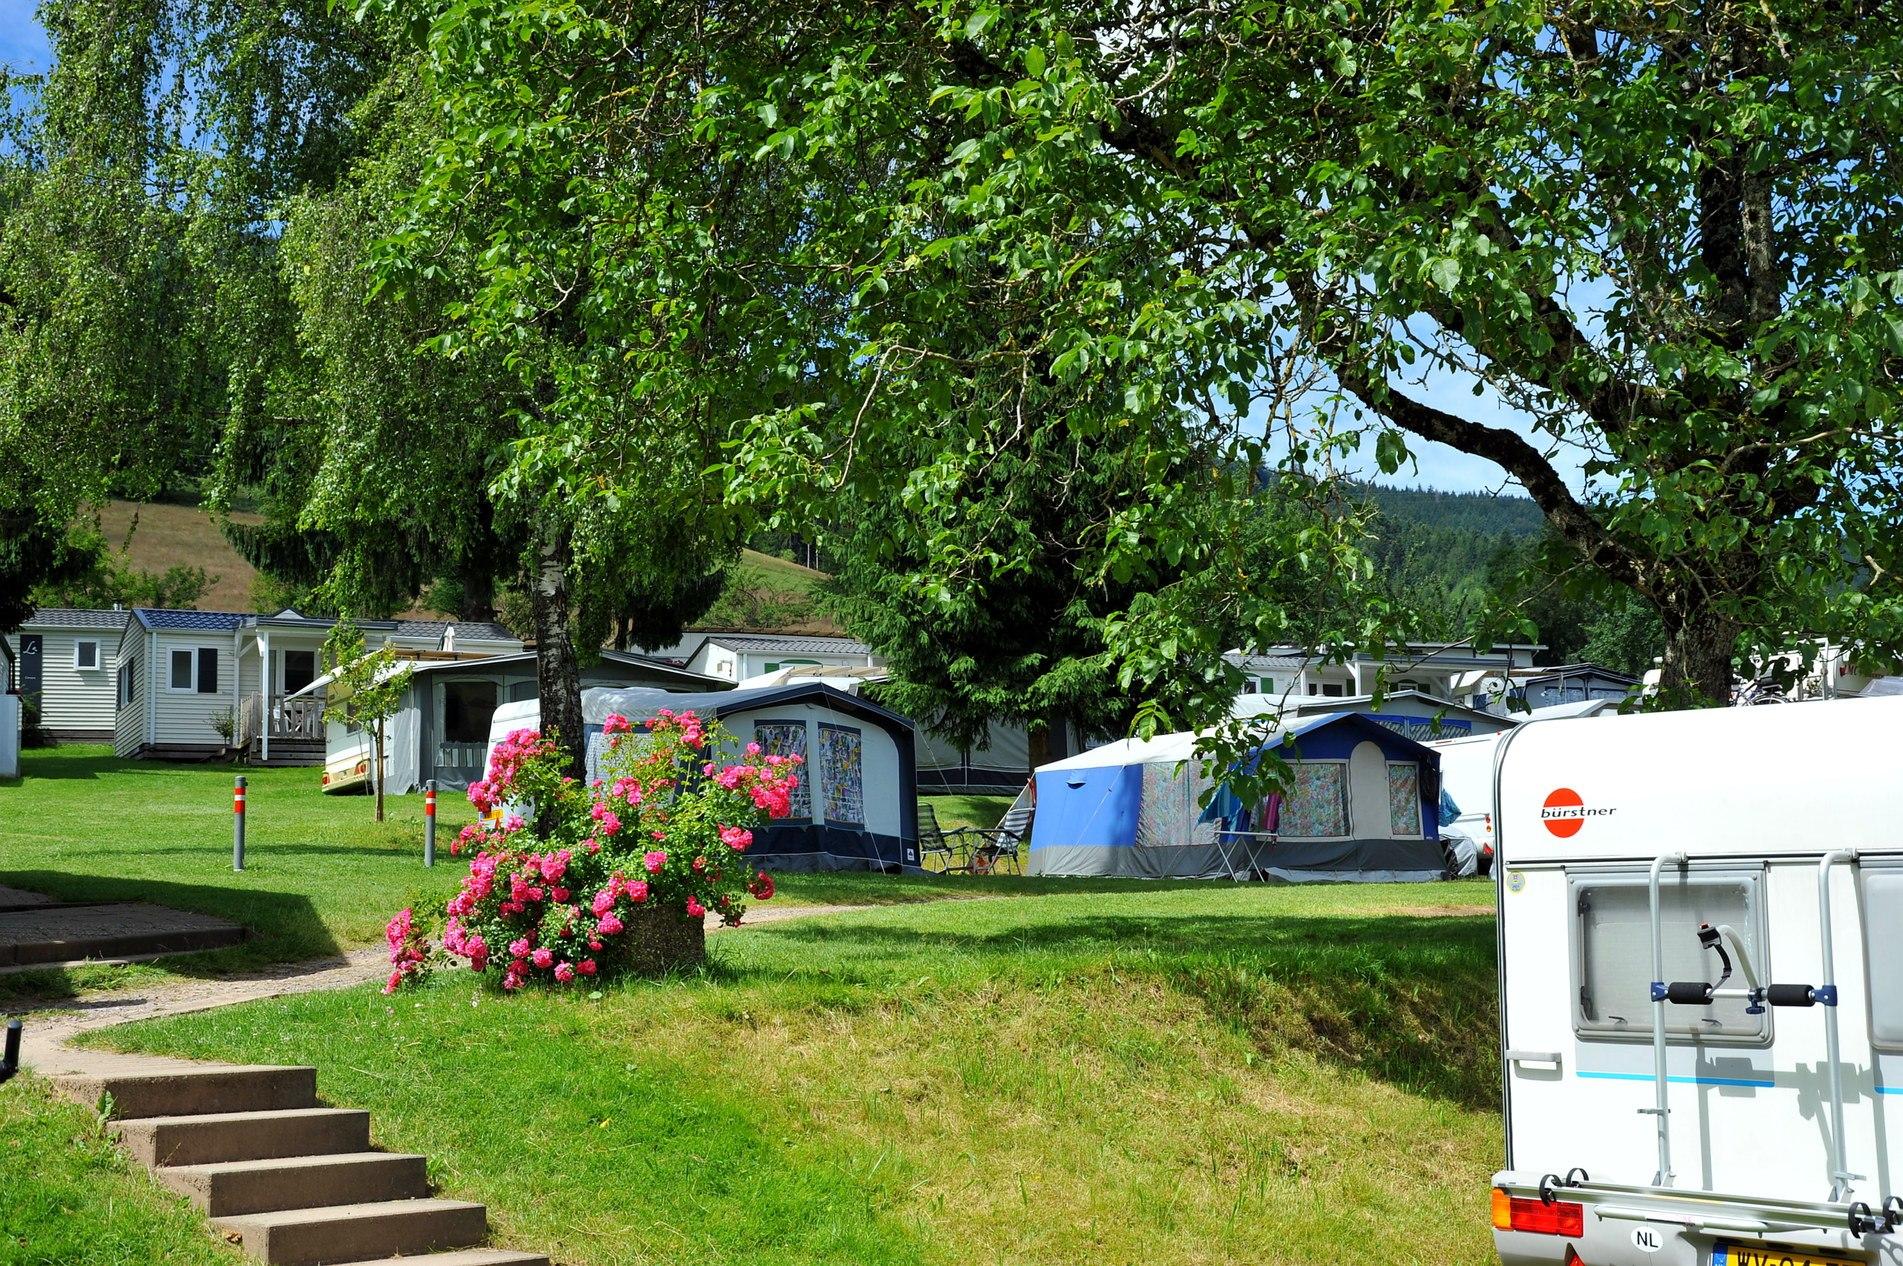 Duitsland-Simonswald-Camping%20Schwarzwaldhorn-ExtraLarge Campings Duitsland